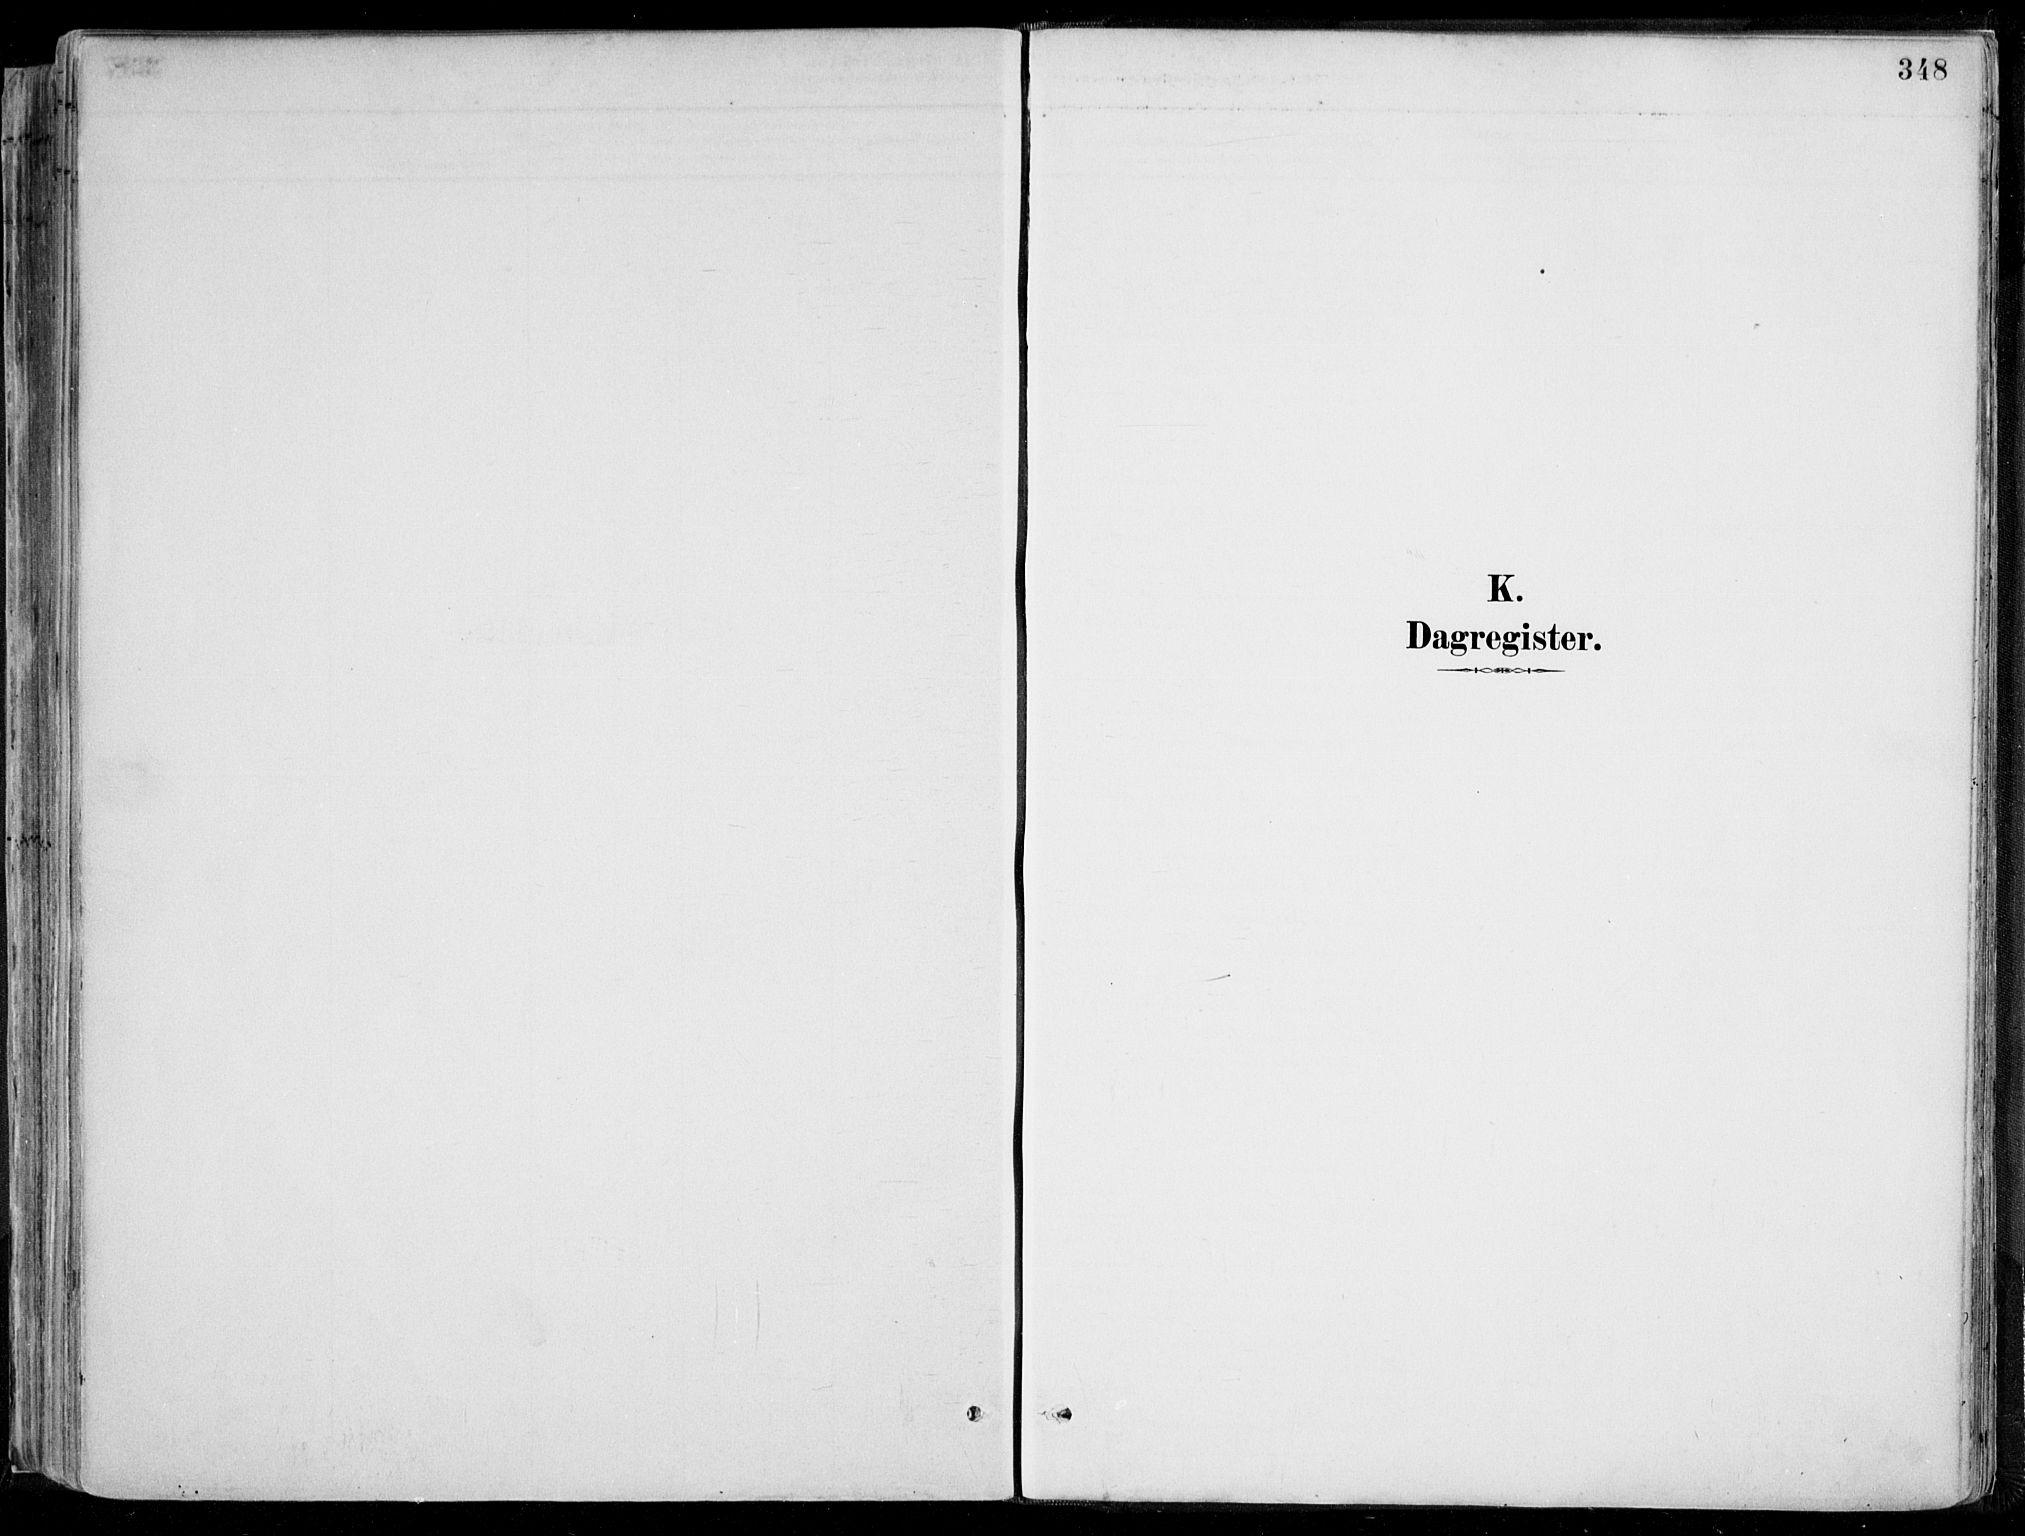 SAK, Øyestad sokneprestkontor, F/Fa/L0017: Ministerialbok nr. A 17, 1887-1896, s. 348